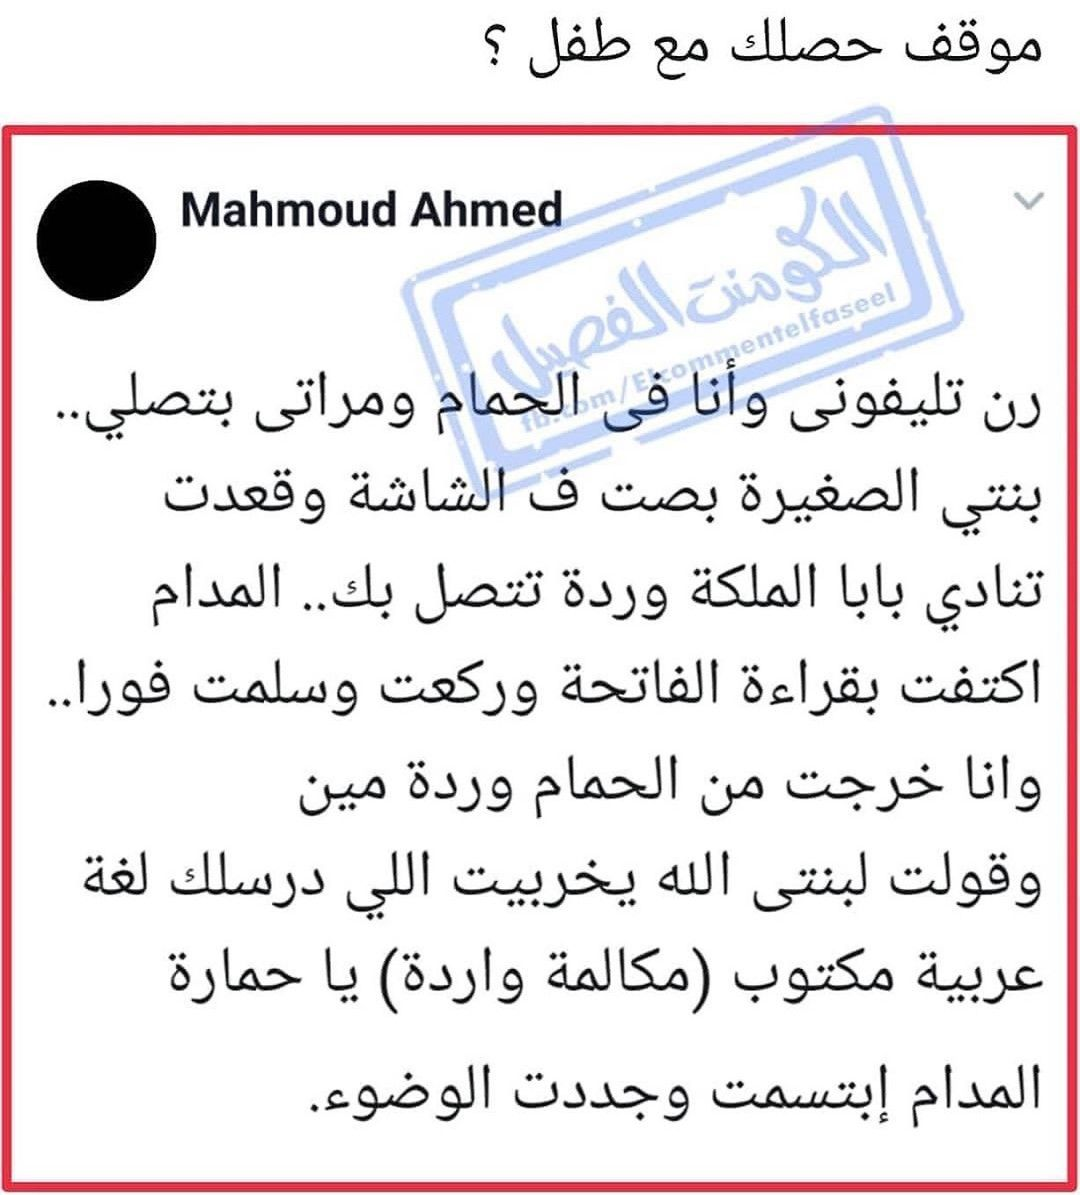 Pin By Marwa Darwish On Funny Arabic Jokes نكت بالعربي Funny Photo Memes Funny Memes Funny